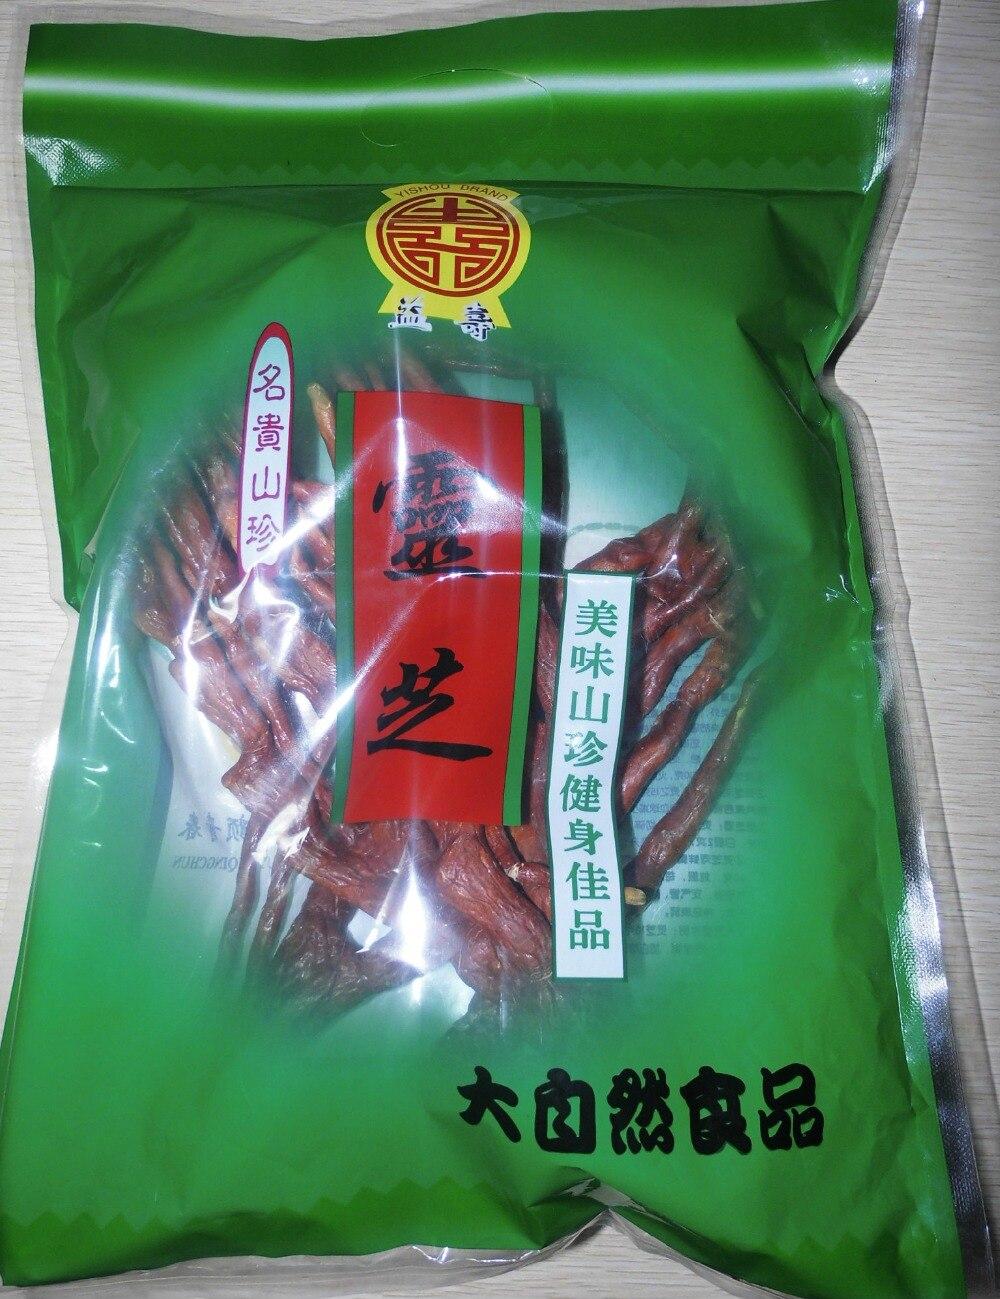 Changbai Mountain special Super glossy ganoderma grass